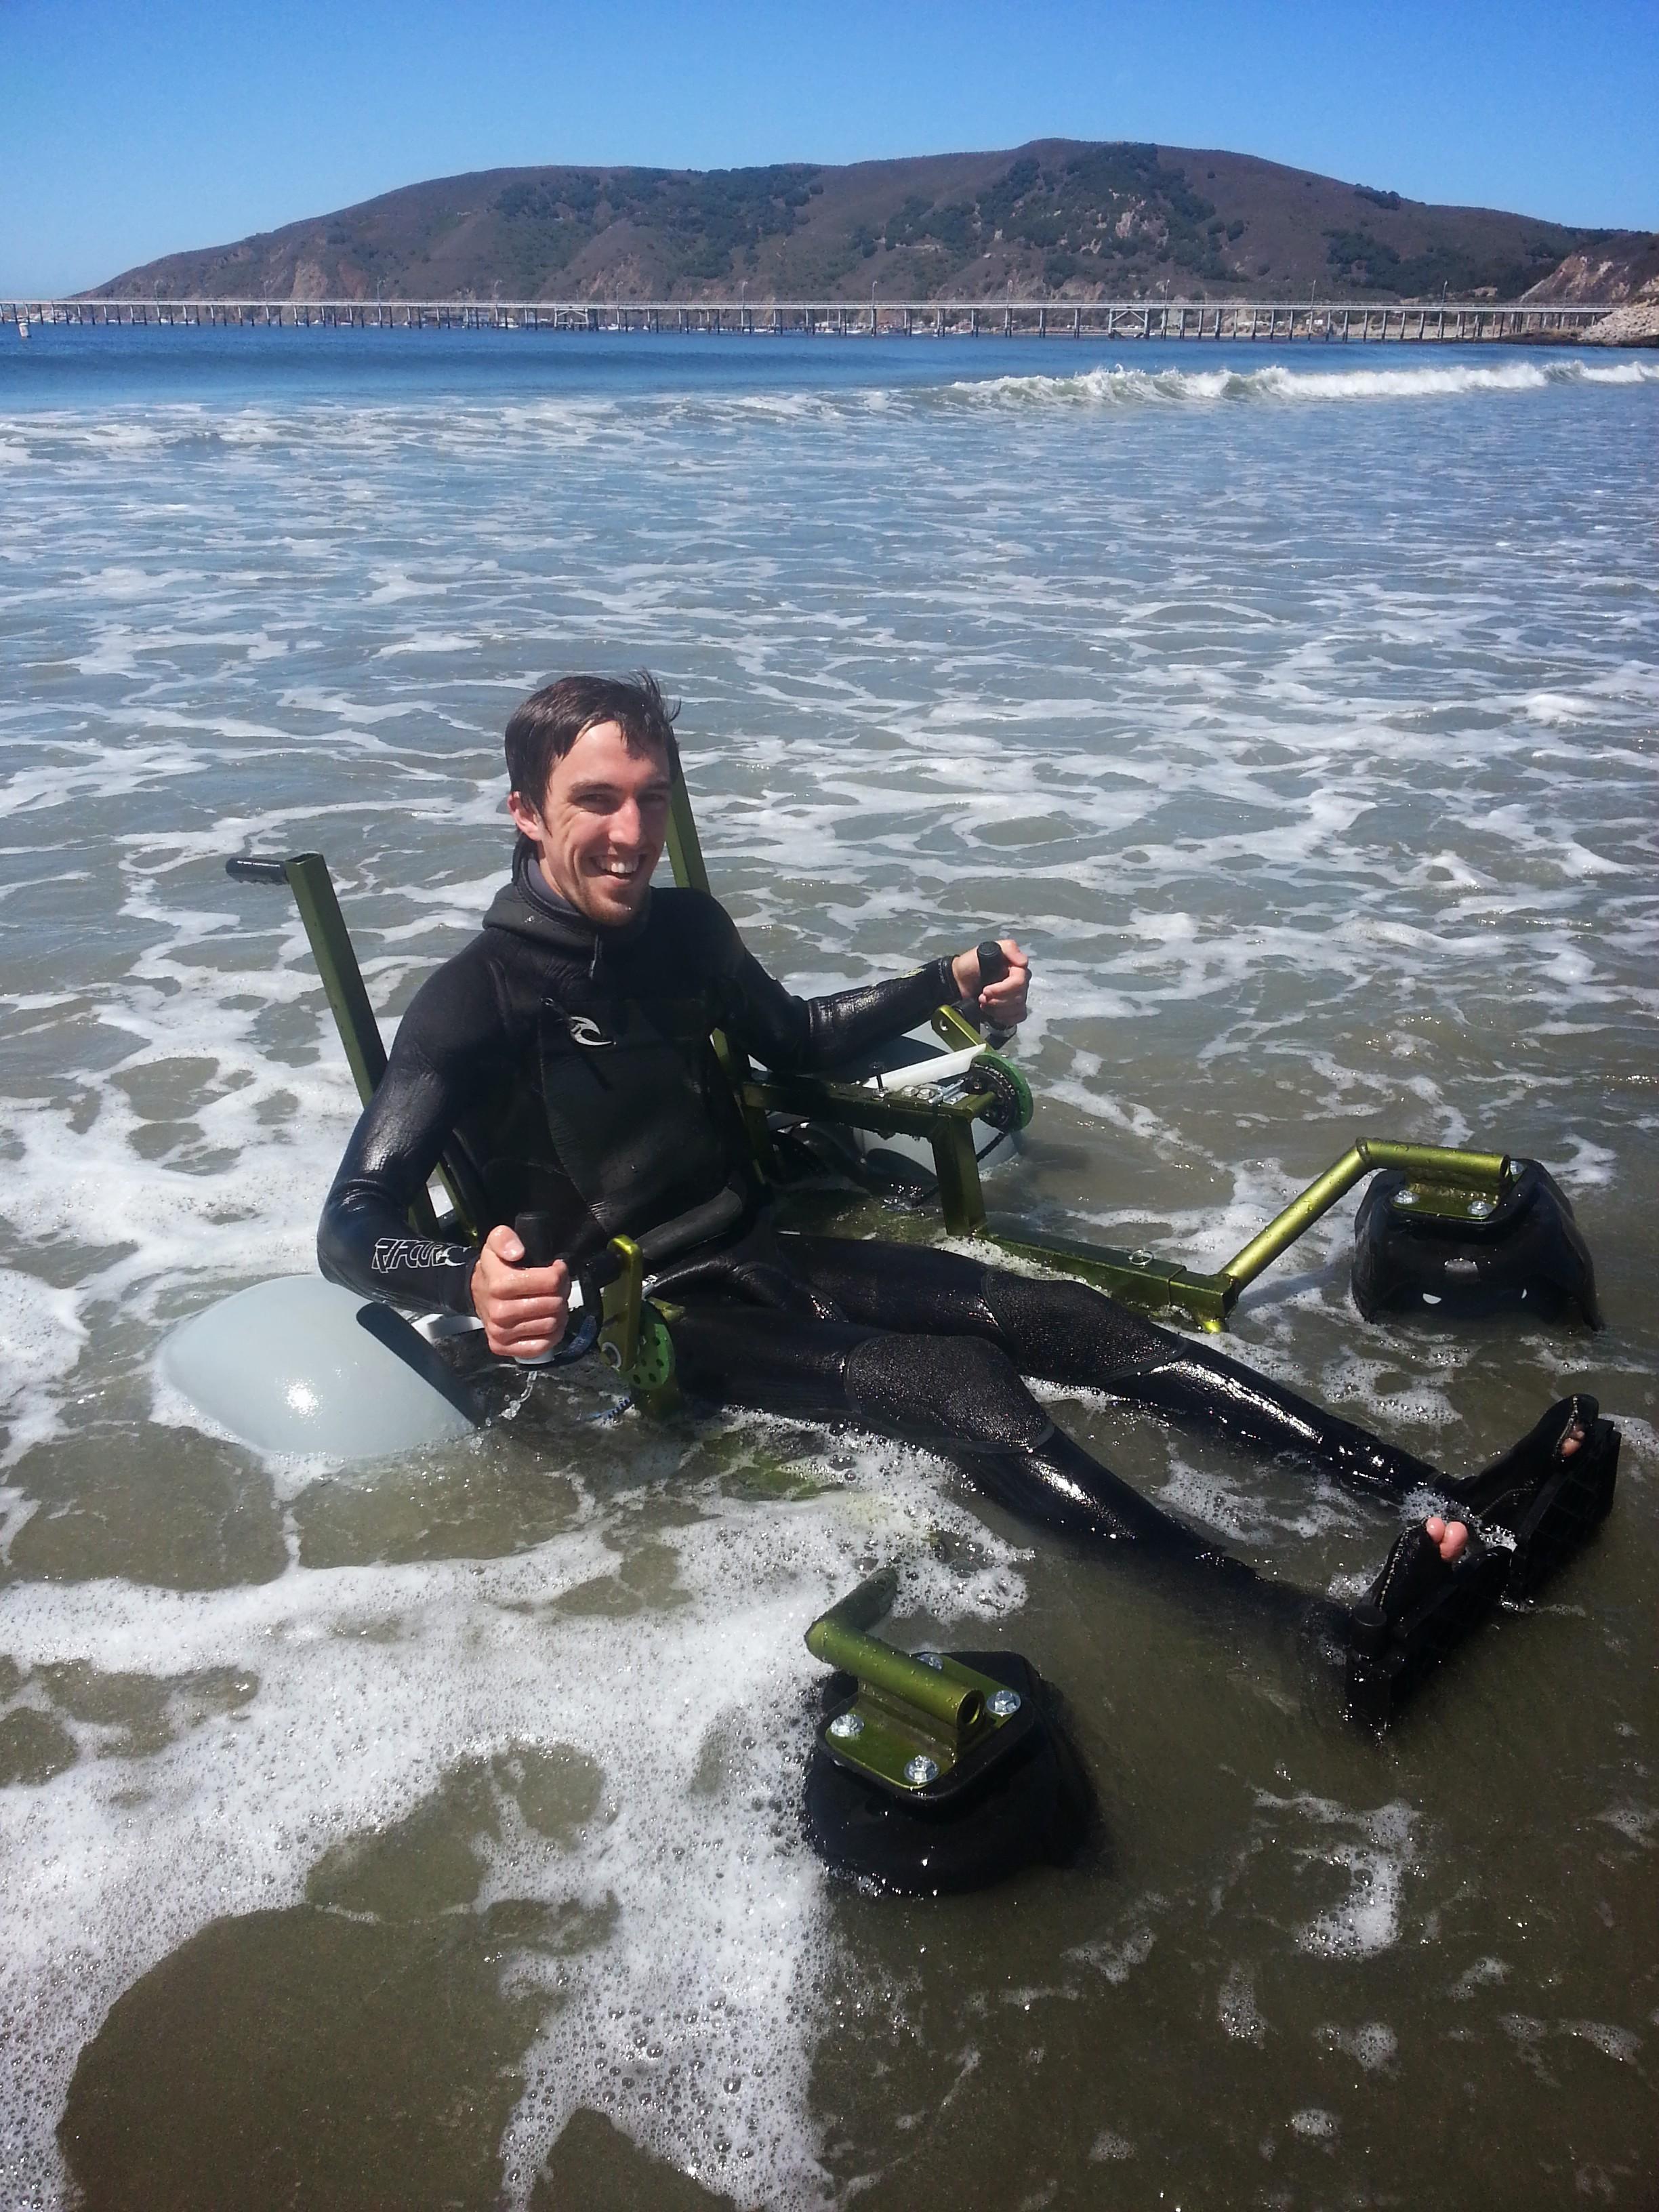 Beach wheel chair in the water